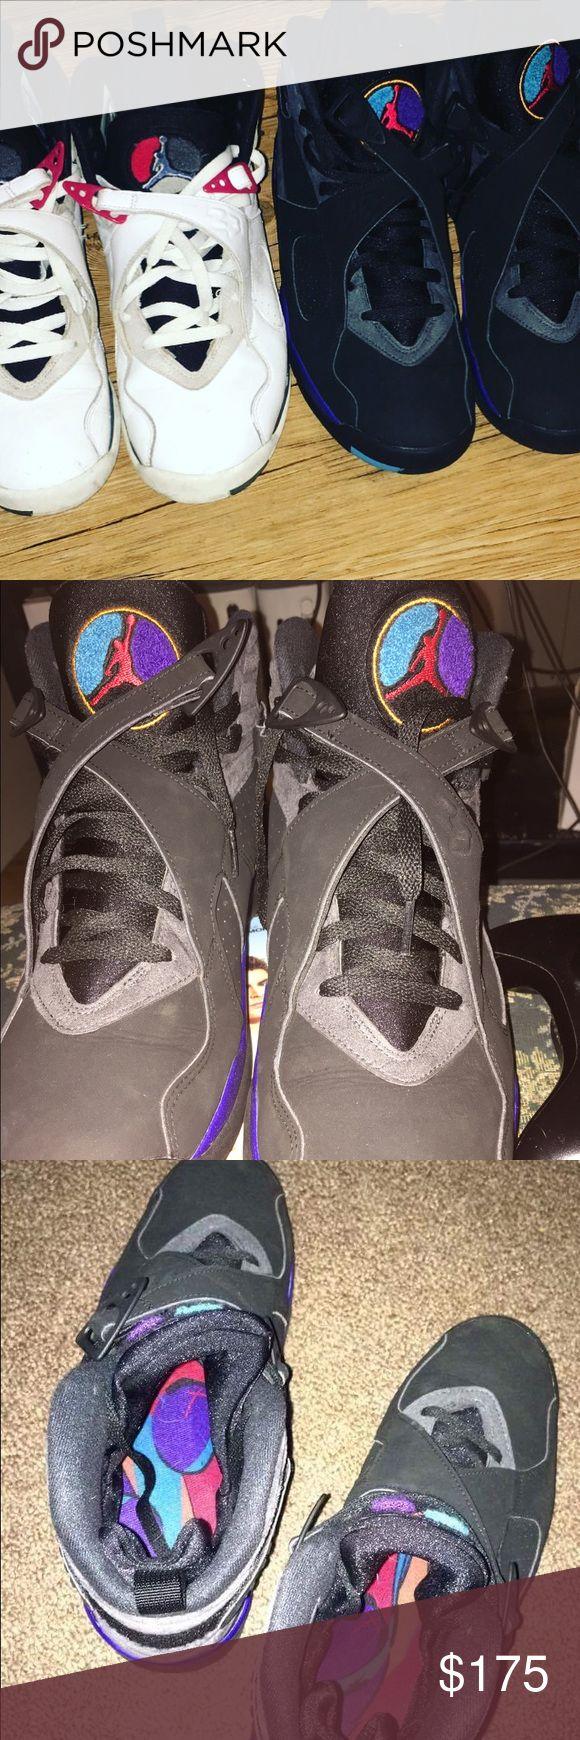 Jordan aqua 8s and Jordan bugs bunny 8s Looking for trades Jordan Shoes Athletic Shoes